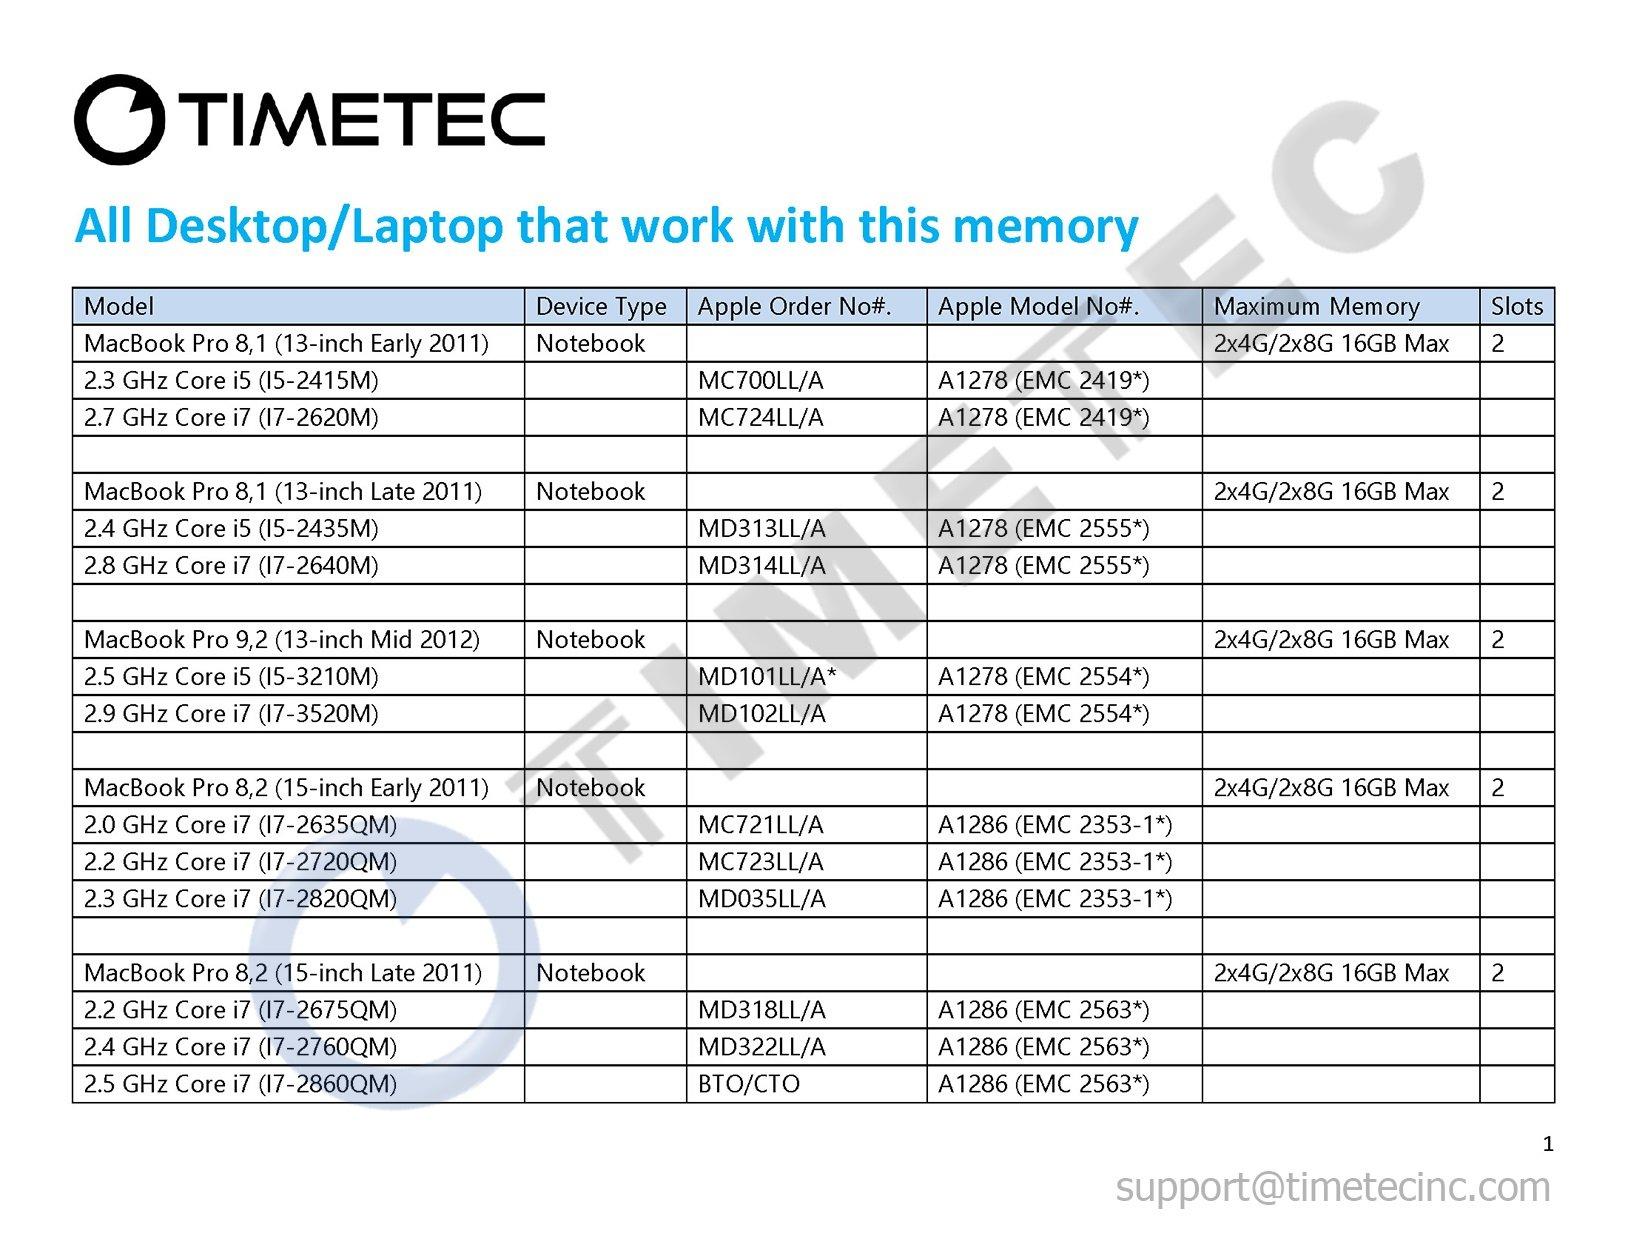 Timetec Hynix IC Apple 16GB Kit (2x8GB) DDR3L 1600MHz PC3L-12800 SODIMM Memory upgrade For MacBook Pro13-inch/15-inch Mid 2012, iMac 21.5-inch Late 2012/ Early/Late 2013(16GB Kit (2x8GB)) by Timetec (Image #2)